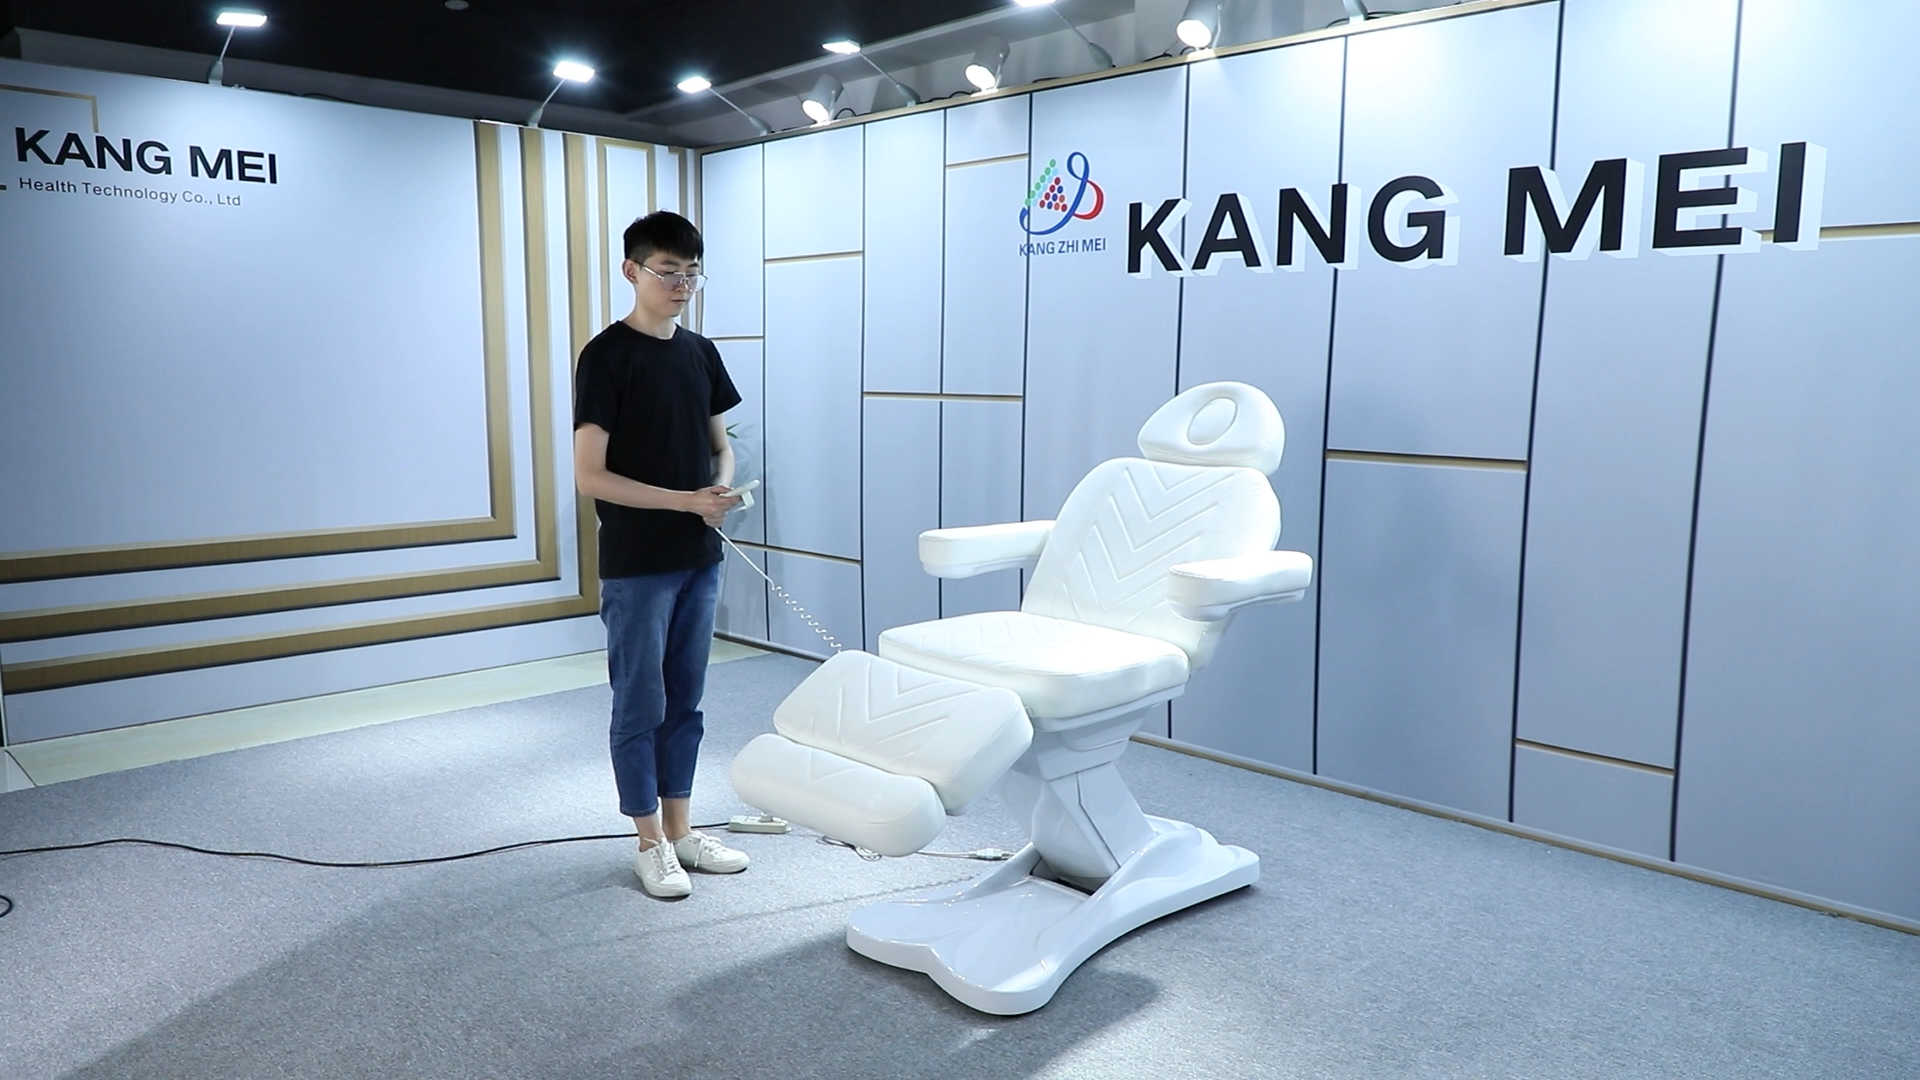 Adjustable Spa Salon Cosmetic 3 Electric Motors Beauty Treatment Massage Table lift Eyelash Bed Podiatry Tattoo Facial Chair